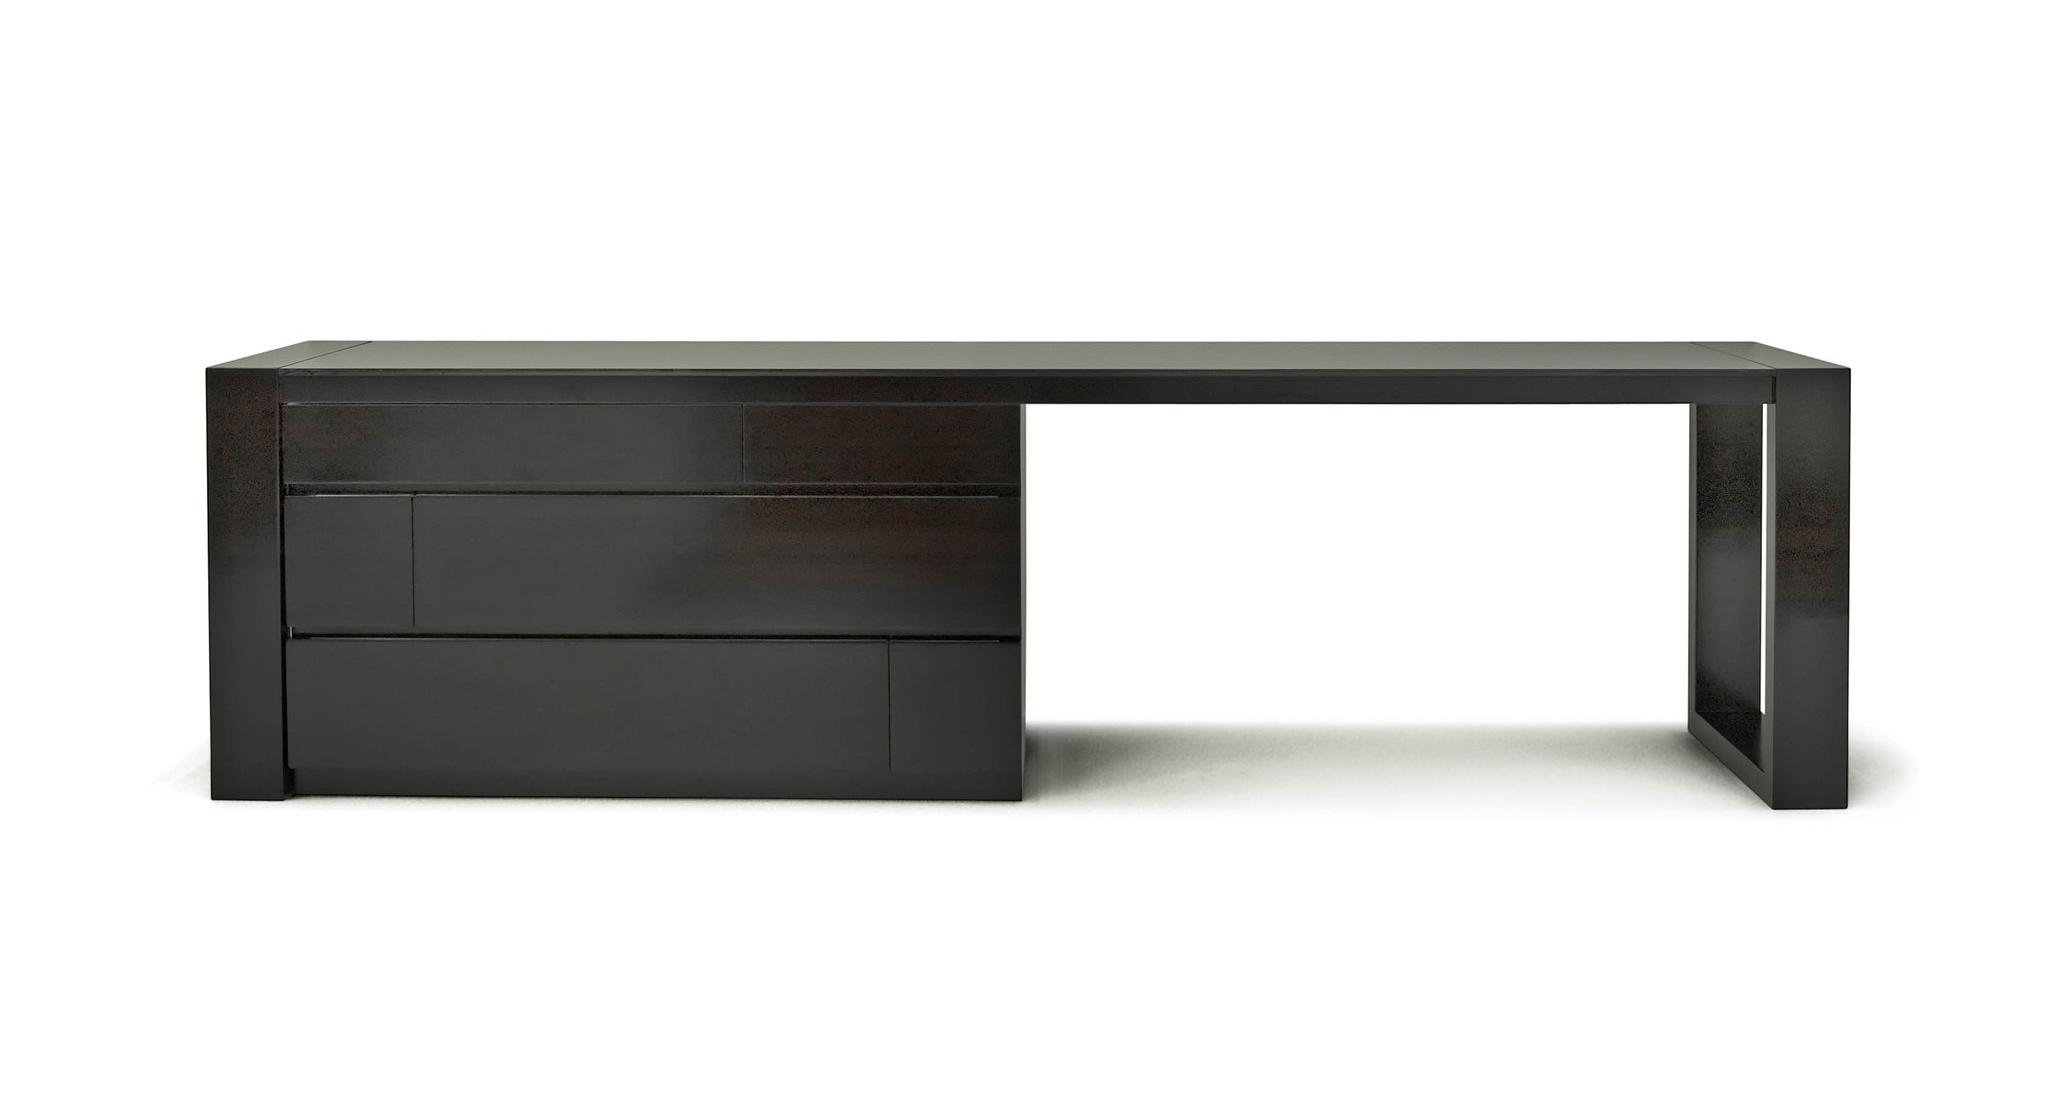 ....bespoke modern furniture : cabinet table ..特别定制摩登家具 : 柜台....